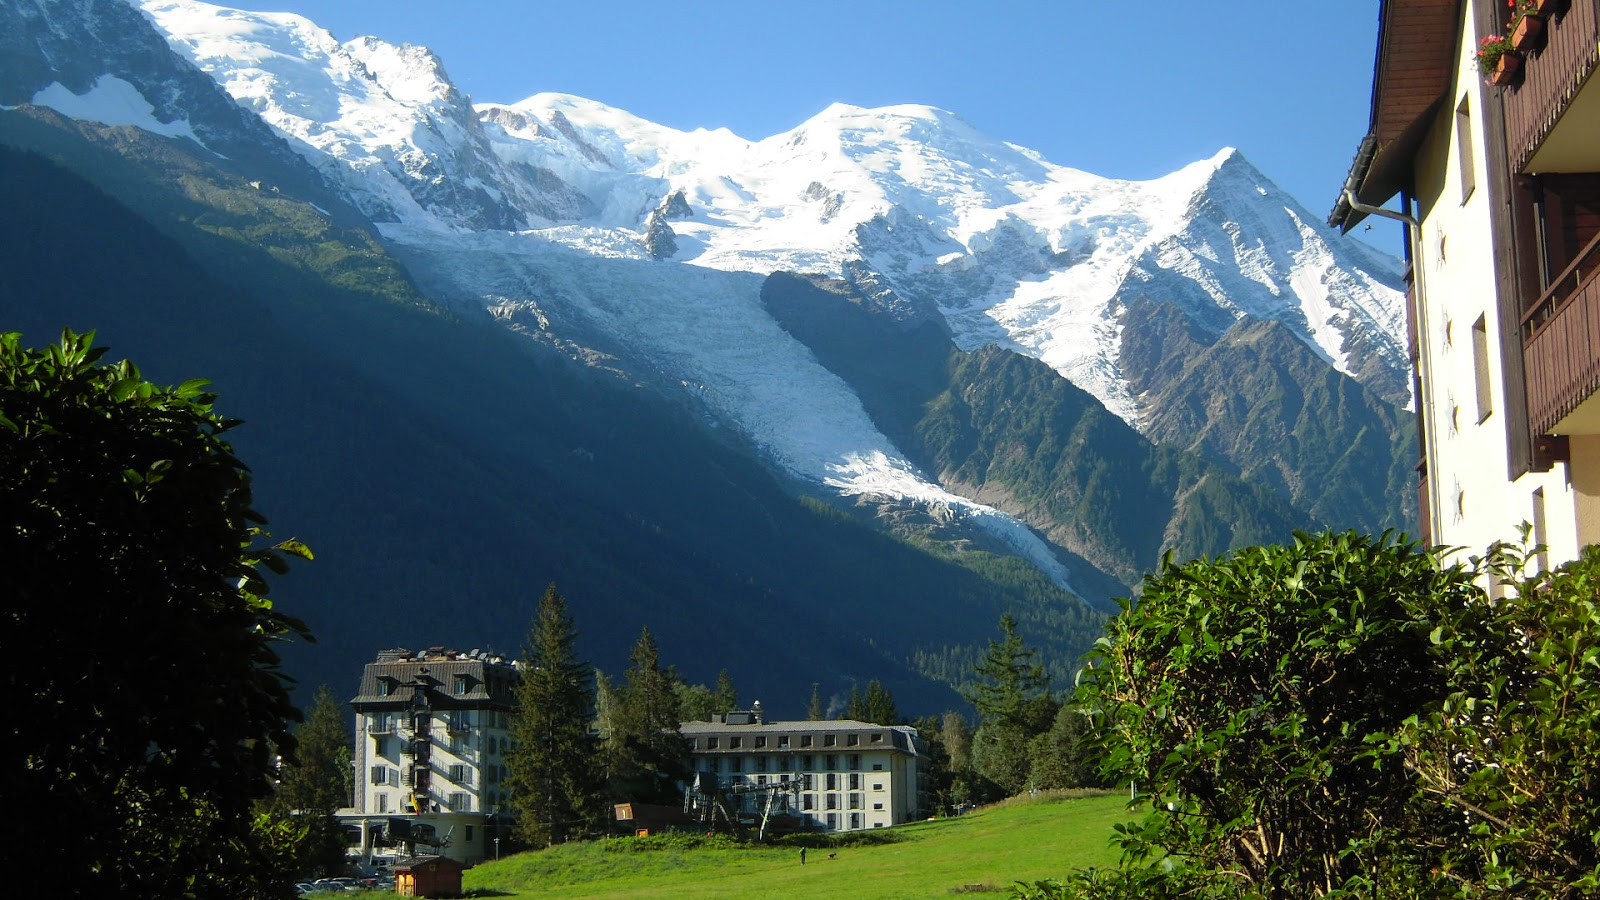 Chamonix mont blanc france tourist destinations for Hotels chamonix